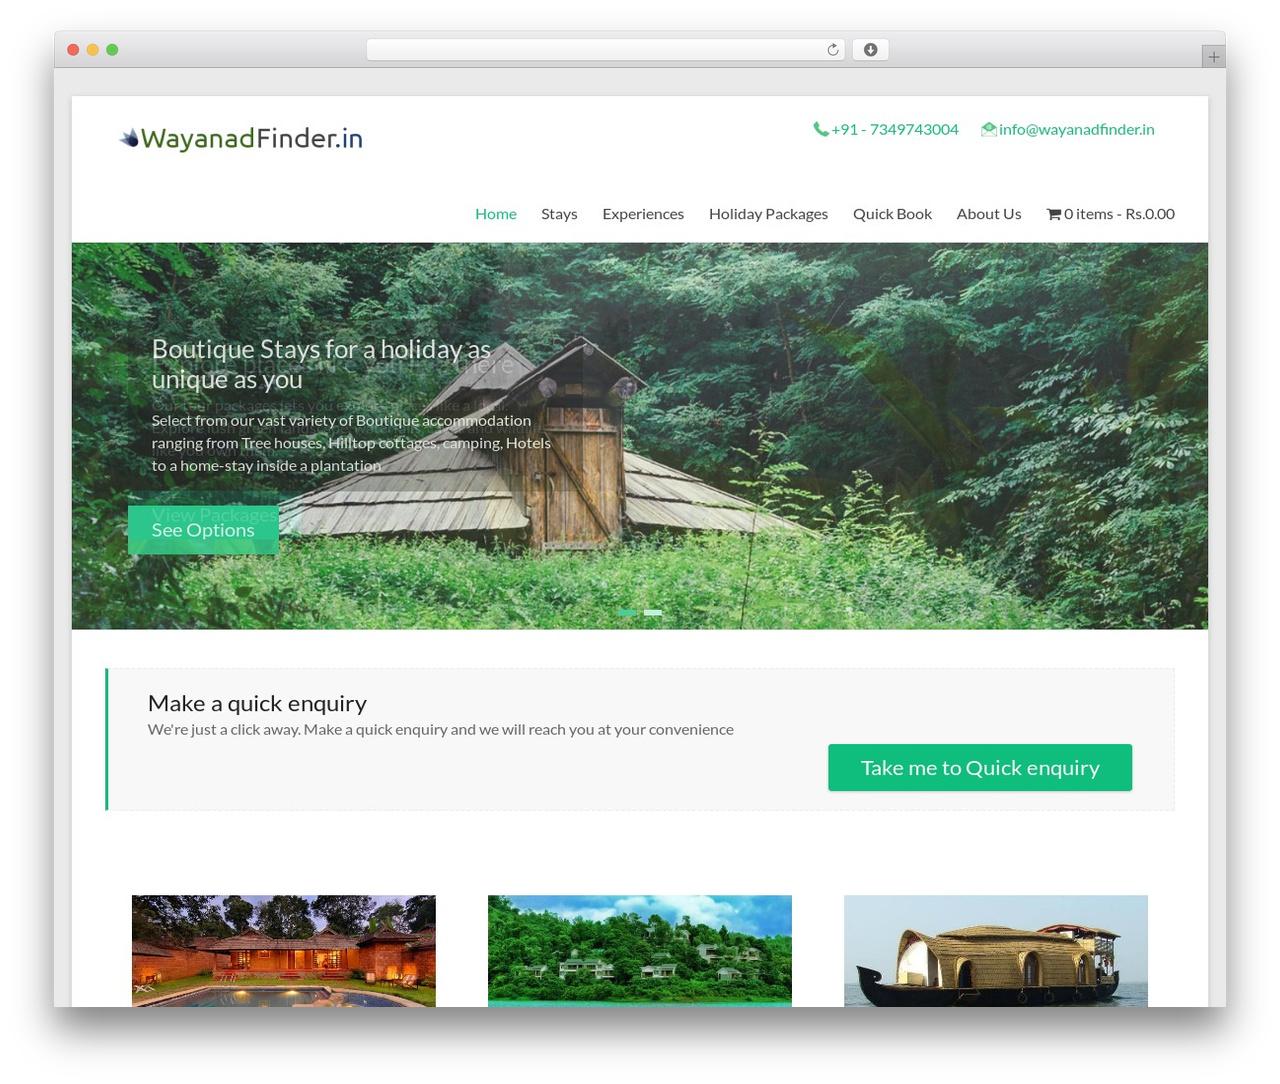 WordPress theme Spacious - wayanadfinder.in